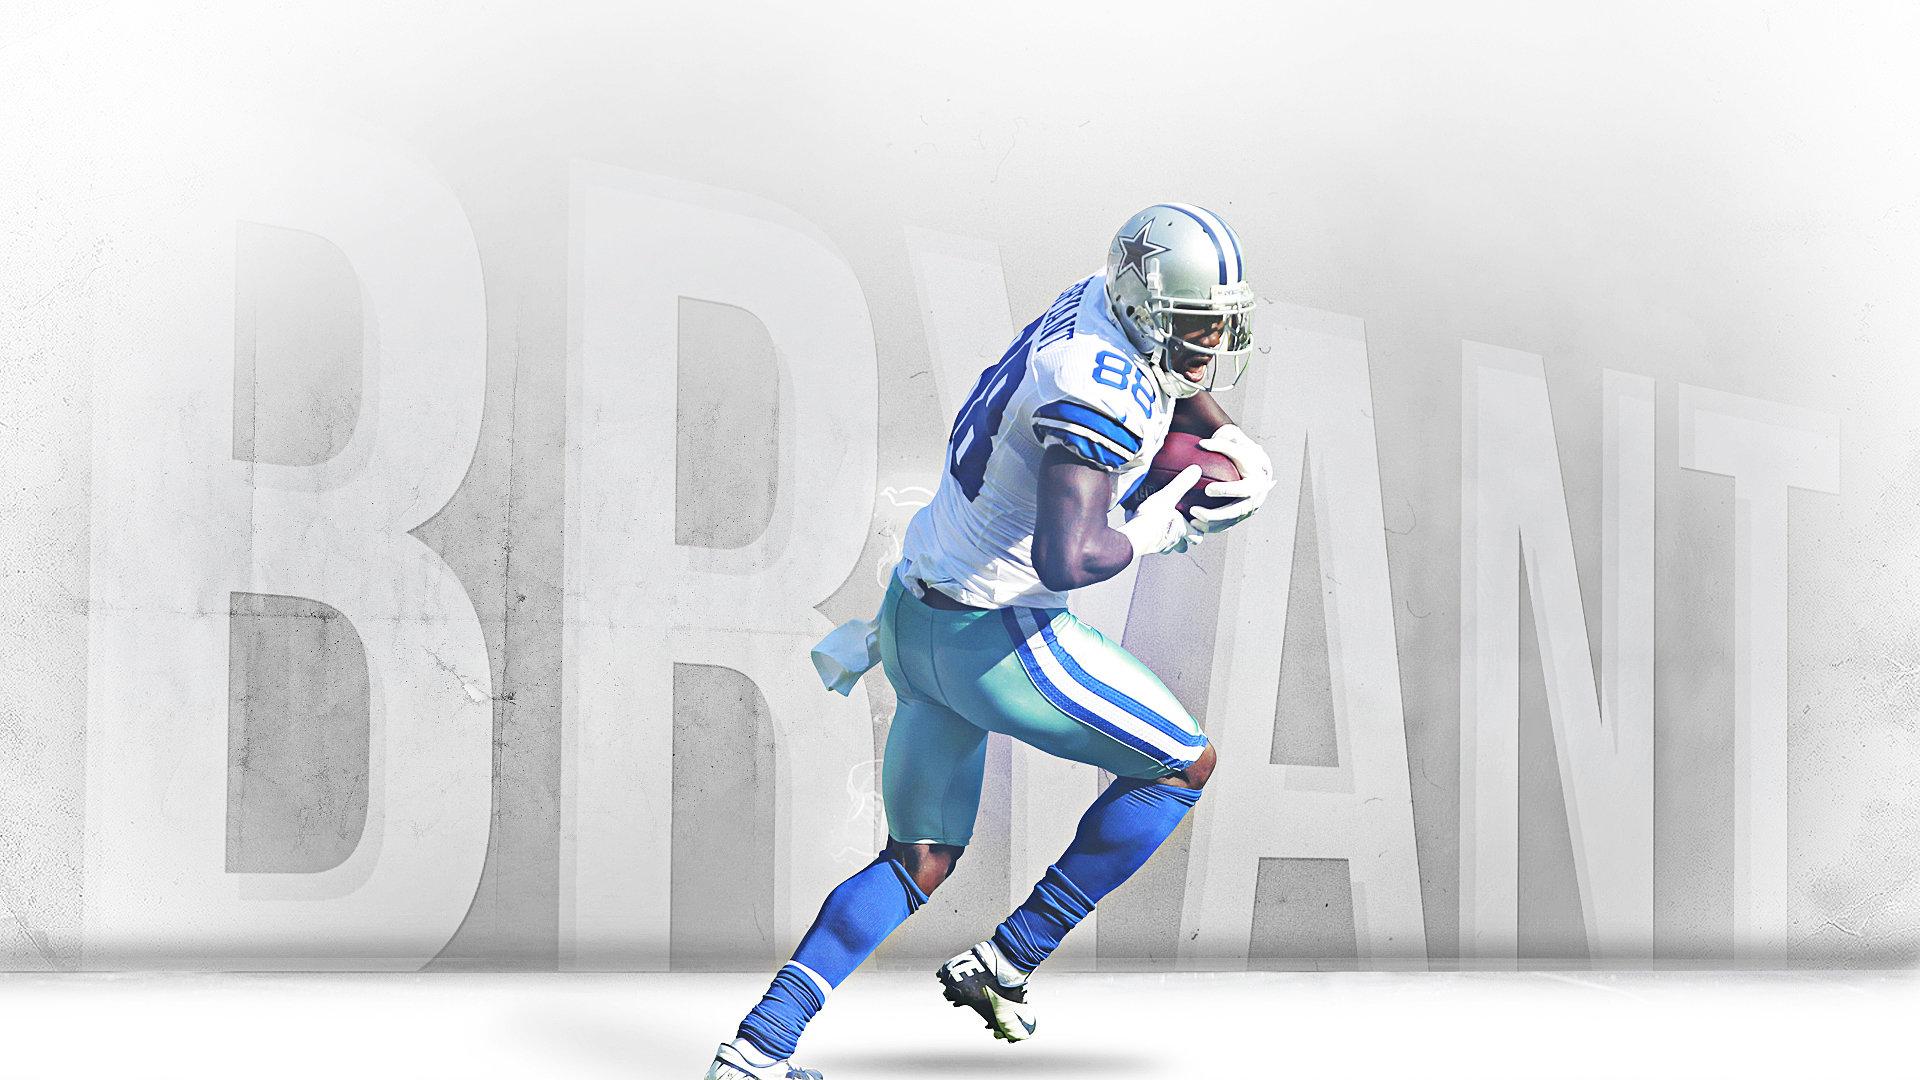 Download Hd Dez Bryant Pc Wallpaper Id - Dez Bryant Desktop Background - HD Wallpaper